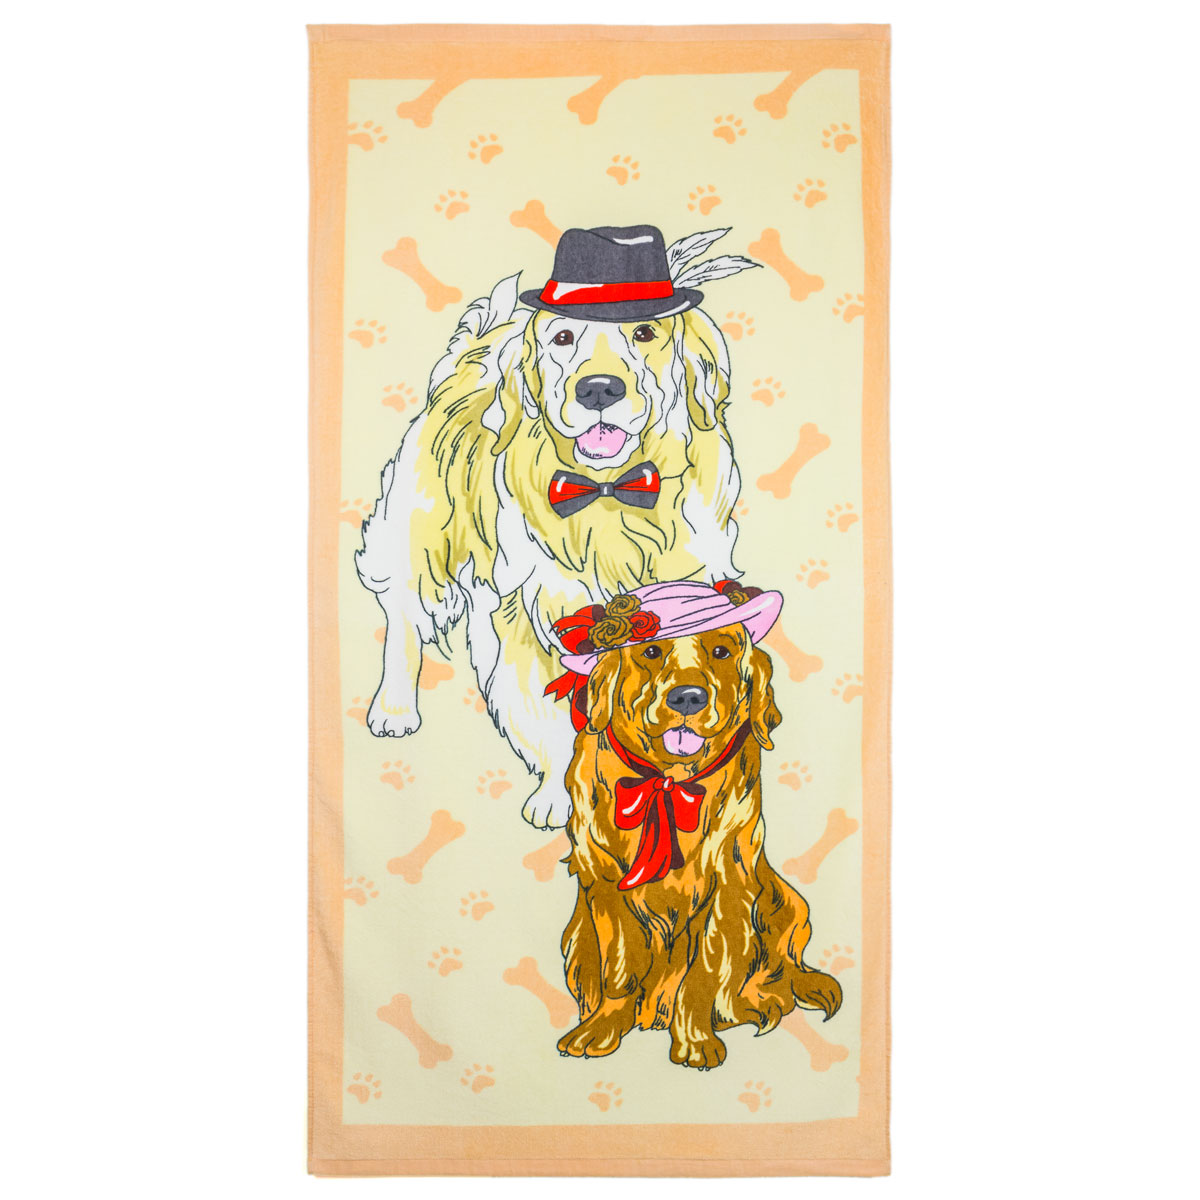 Полотенце С собаками Зеленый р. 65х135Махровые полотенца<br>Плотность ткани: 330 г/кв. м<br><br>Тип: Полотенце<br>Размер: 65х135<br>Материал: Махра